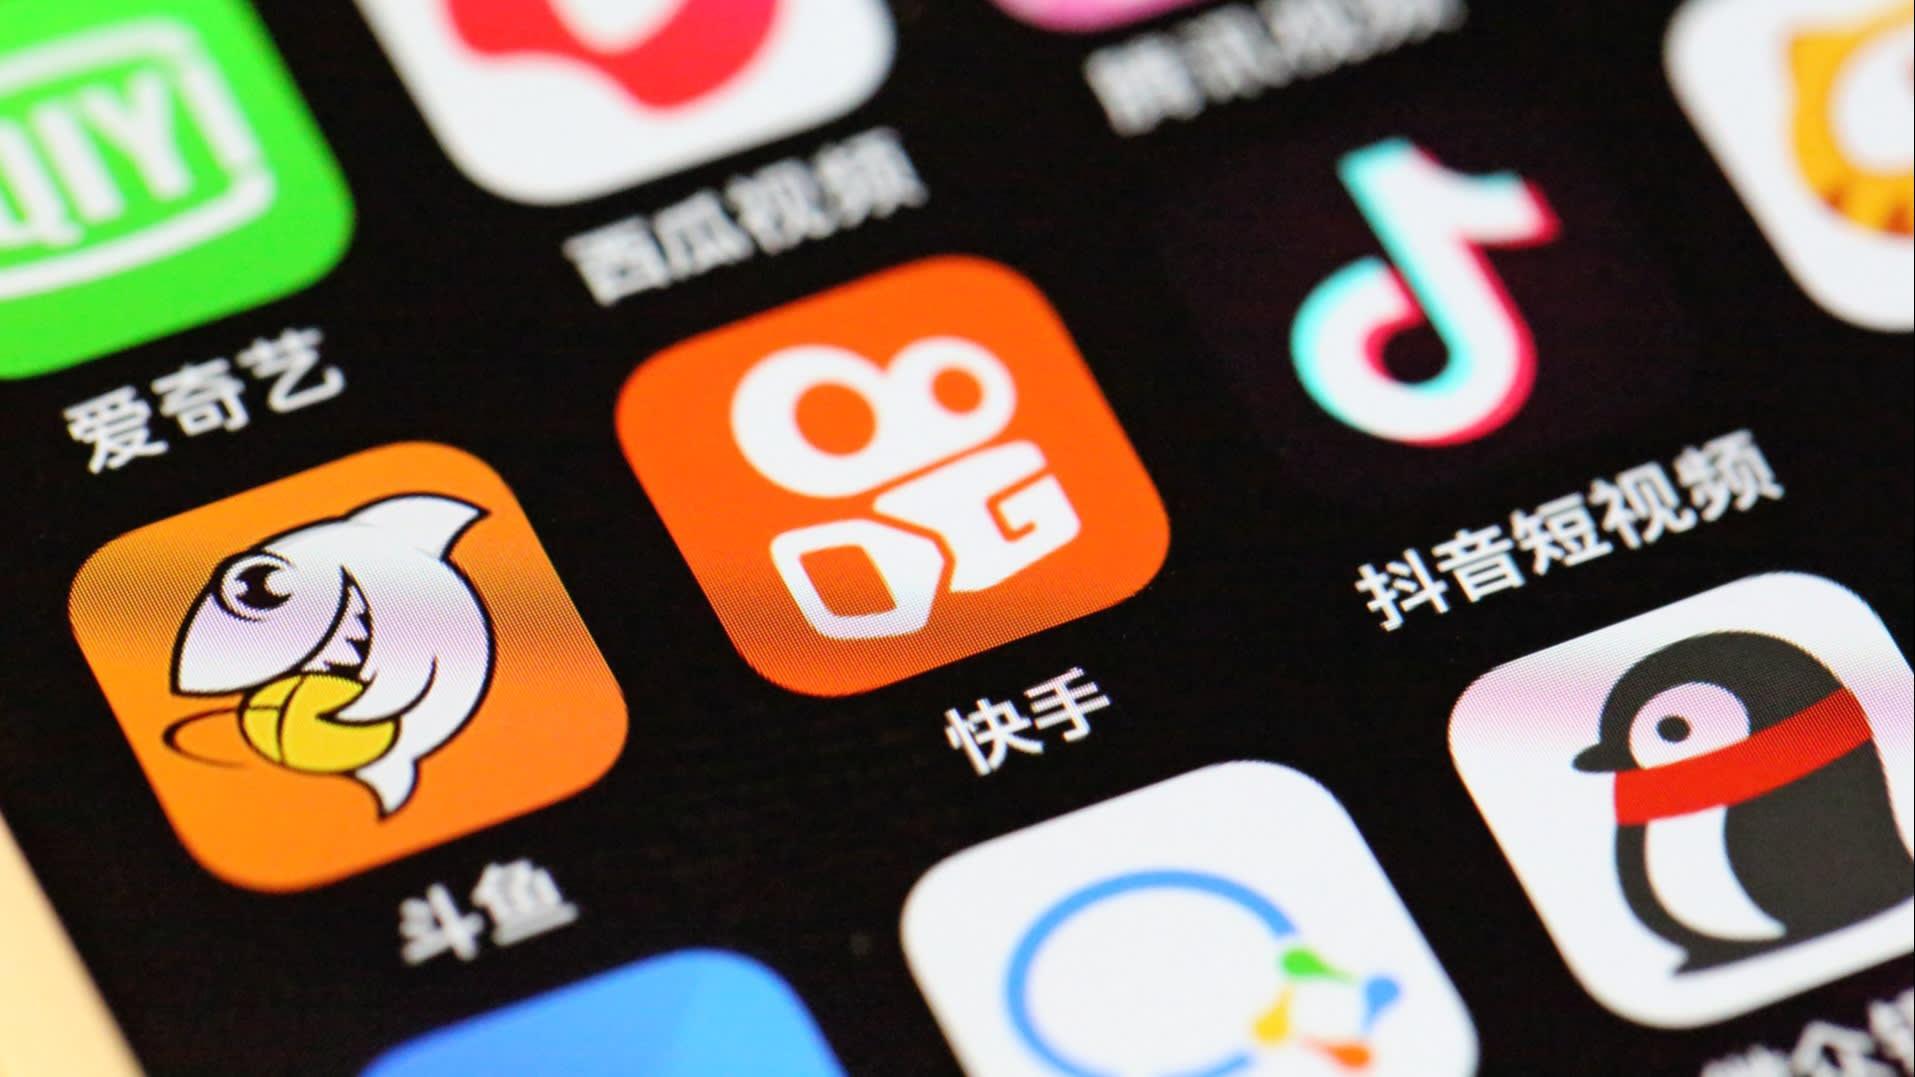 TikTok rival Kuaishou builds $1.4bn data center in China - Nikkei ...